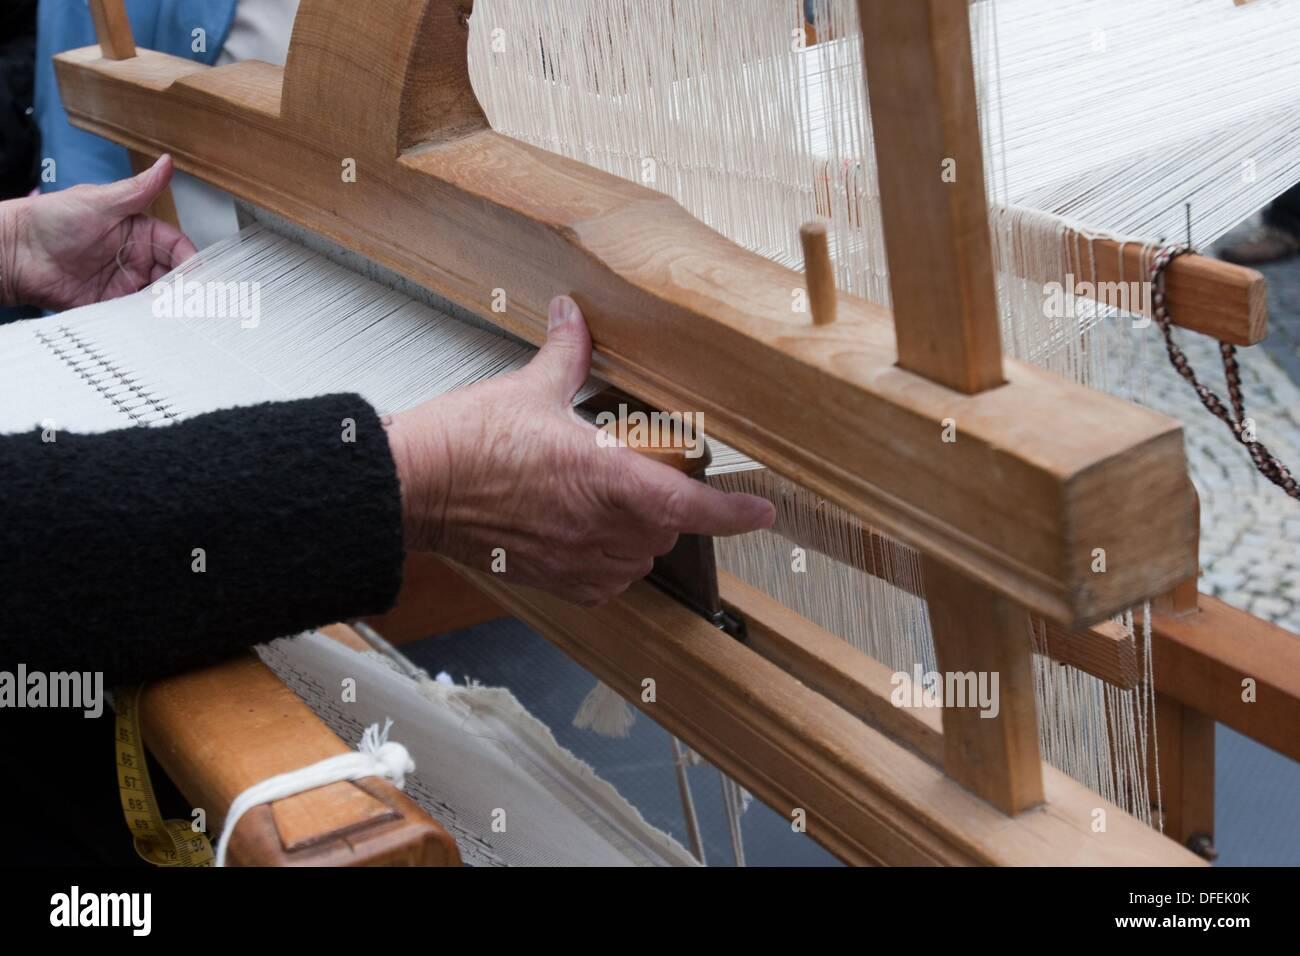 Woman weaving, Loom, Bratislava, Slovakia Stock Photo